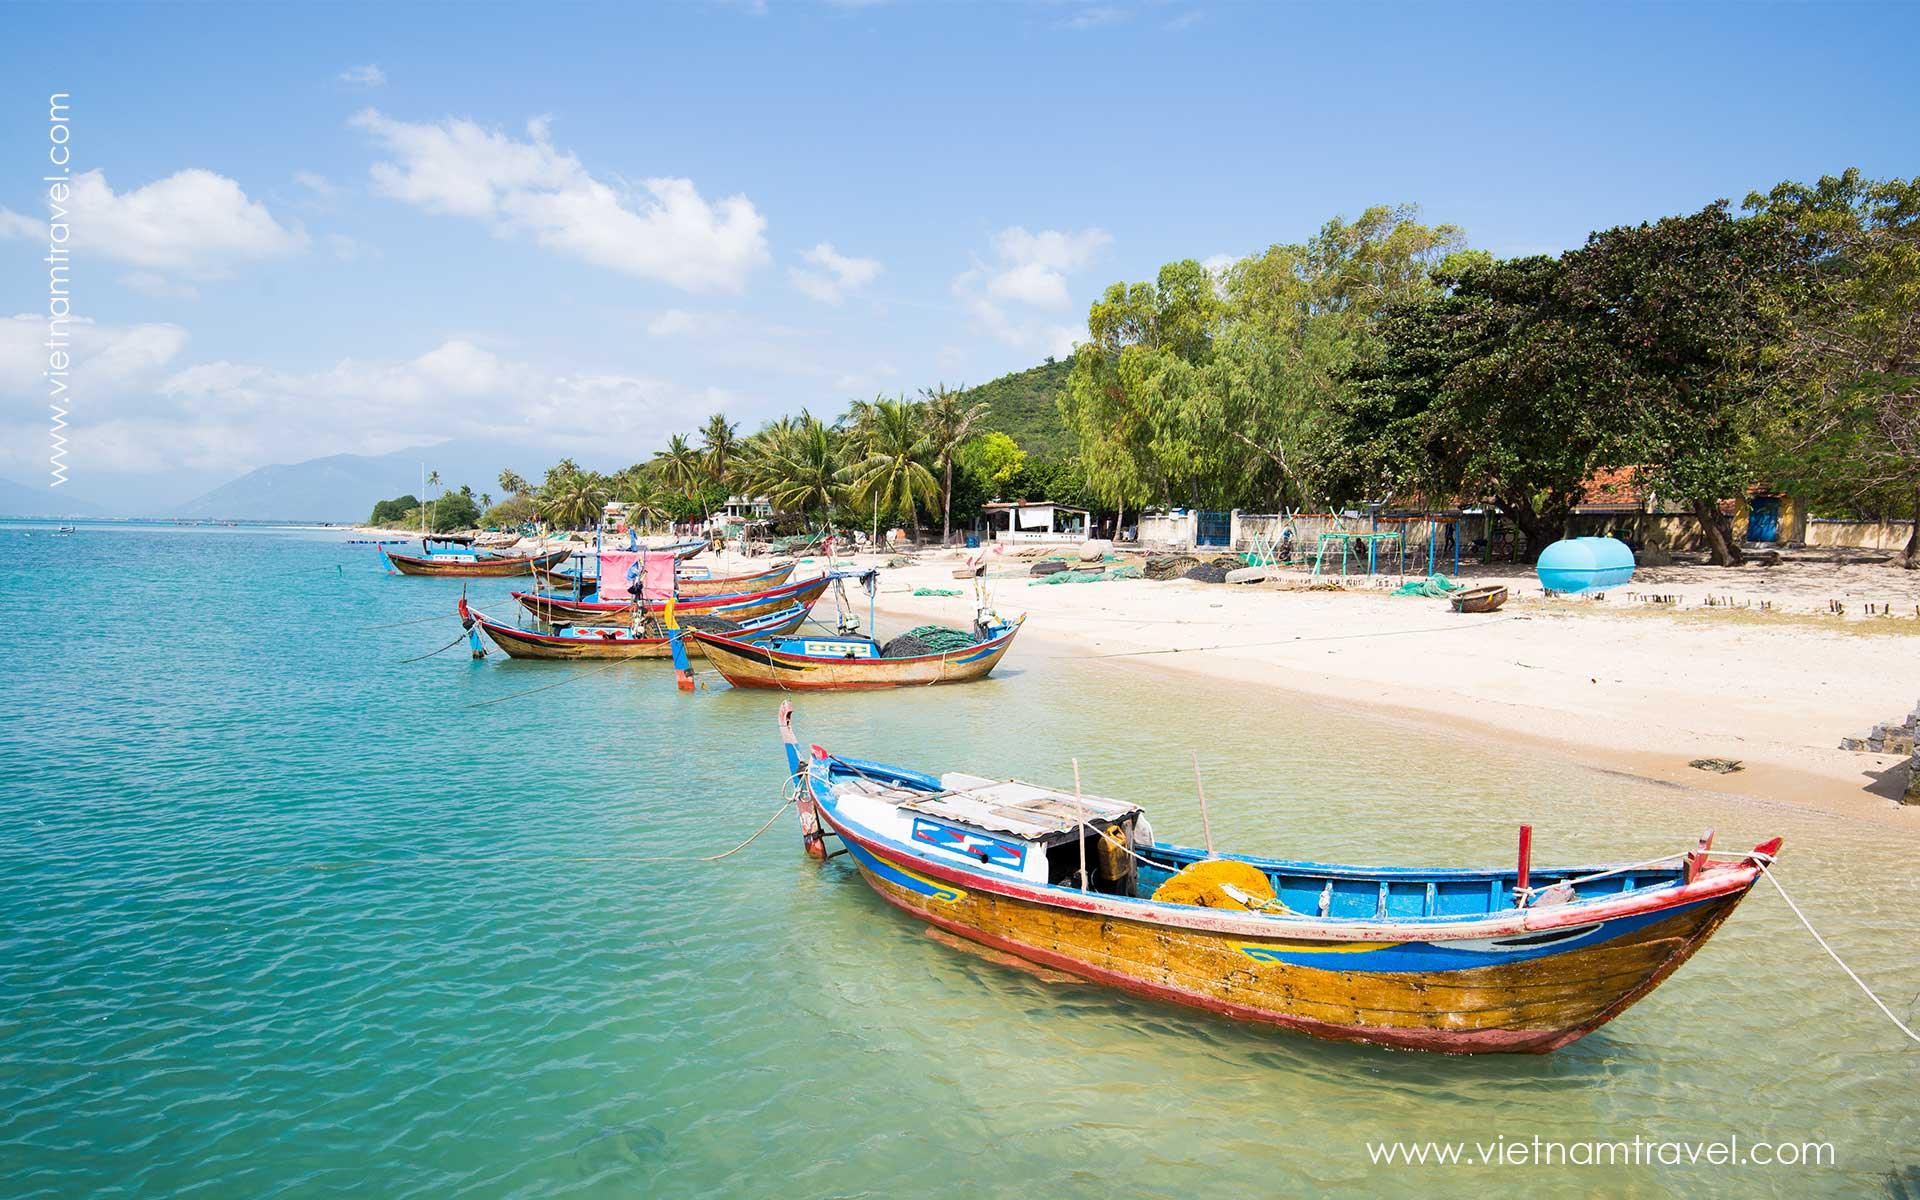 Nhatrang Beach Tran Phu Street View in Summer